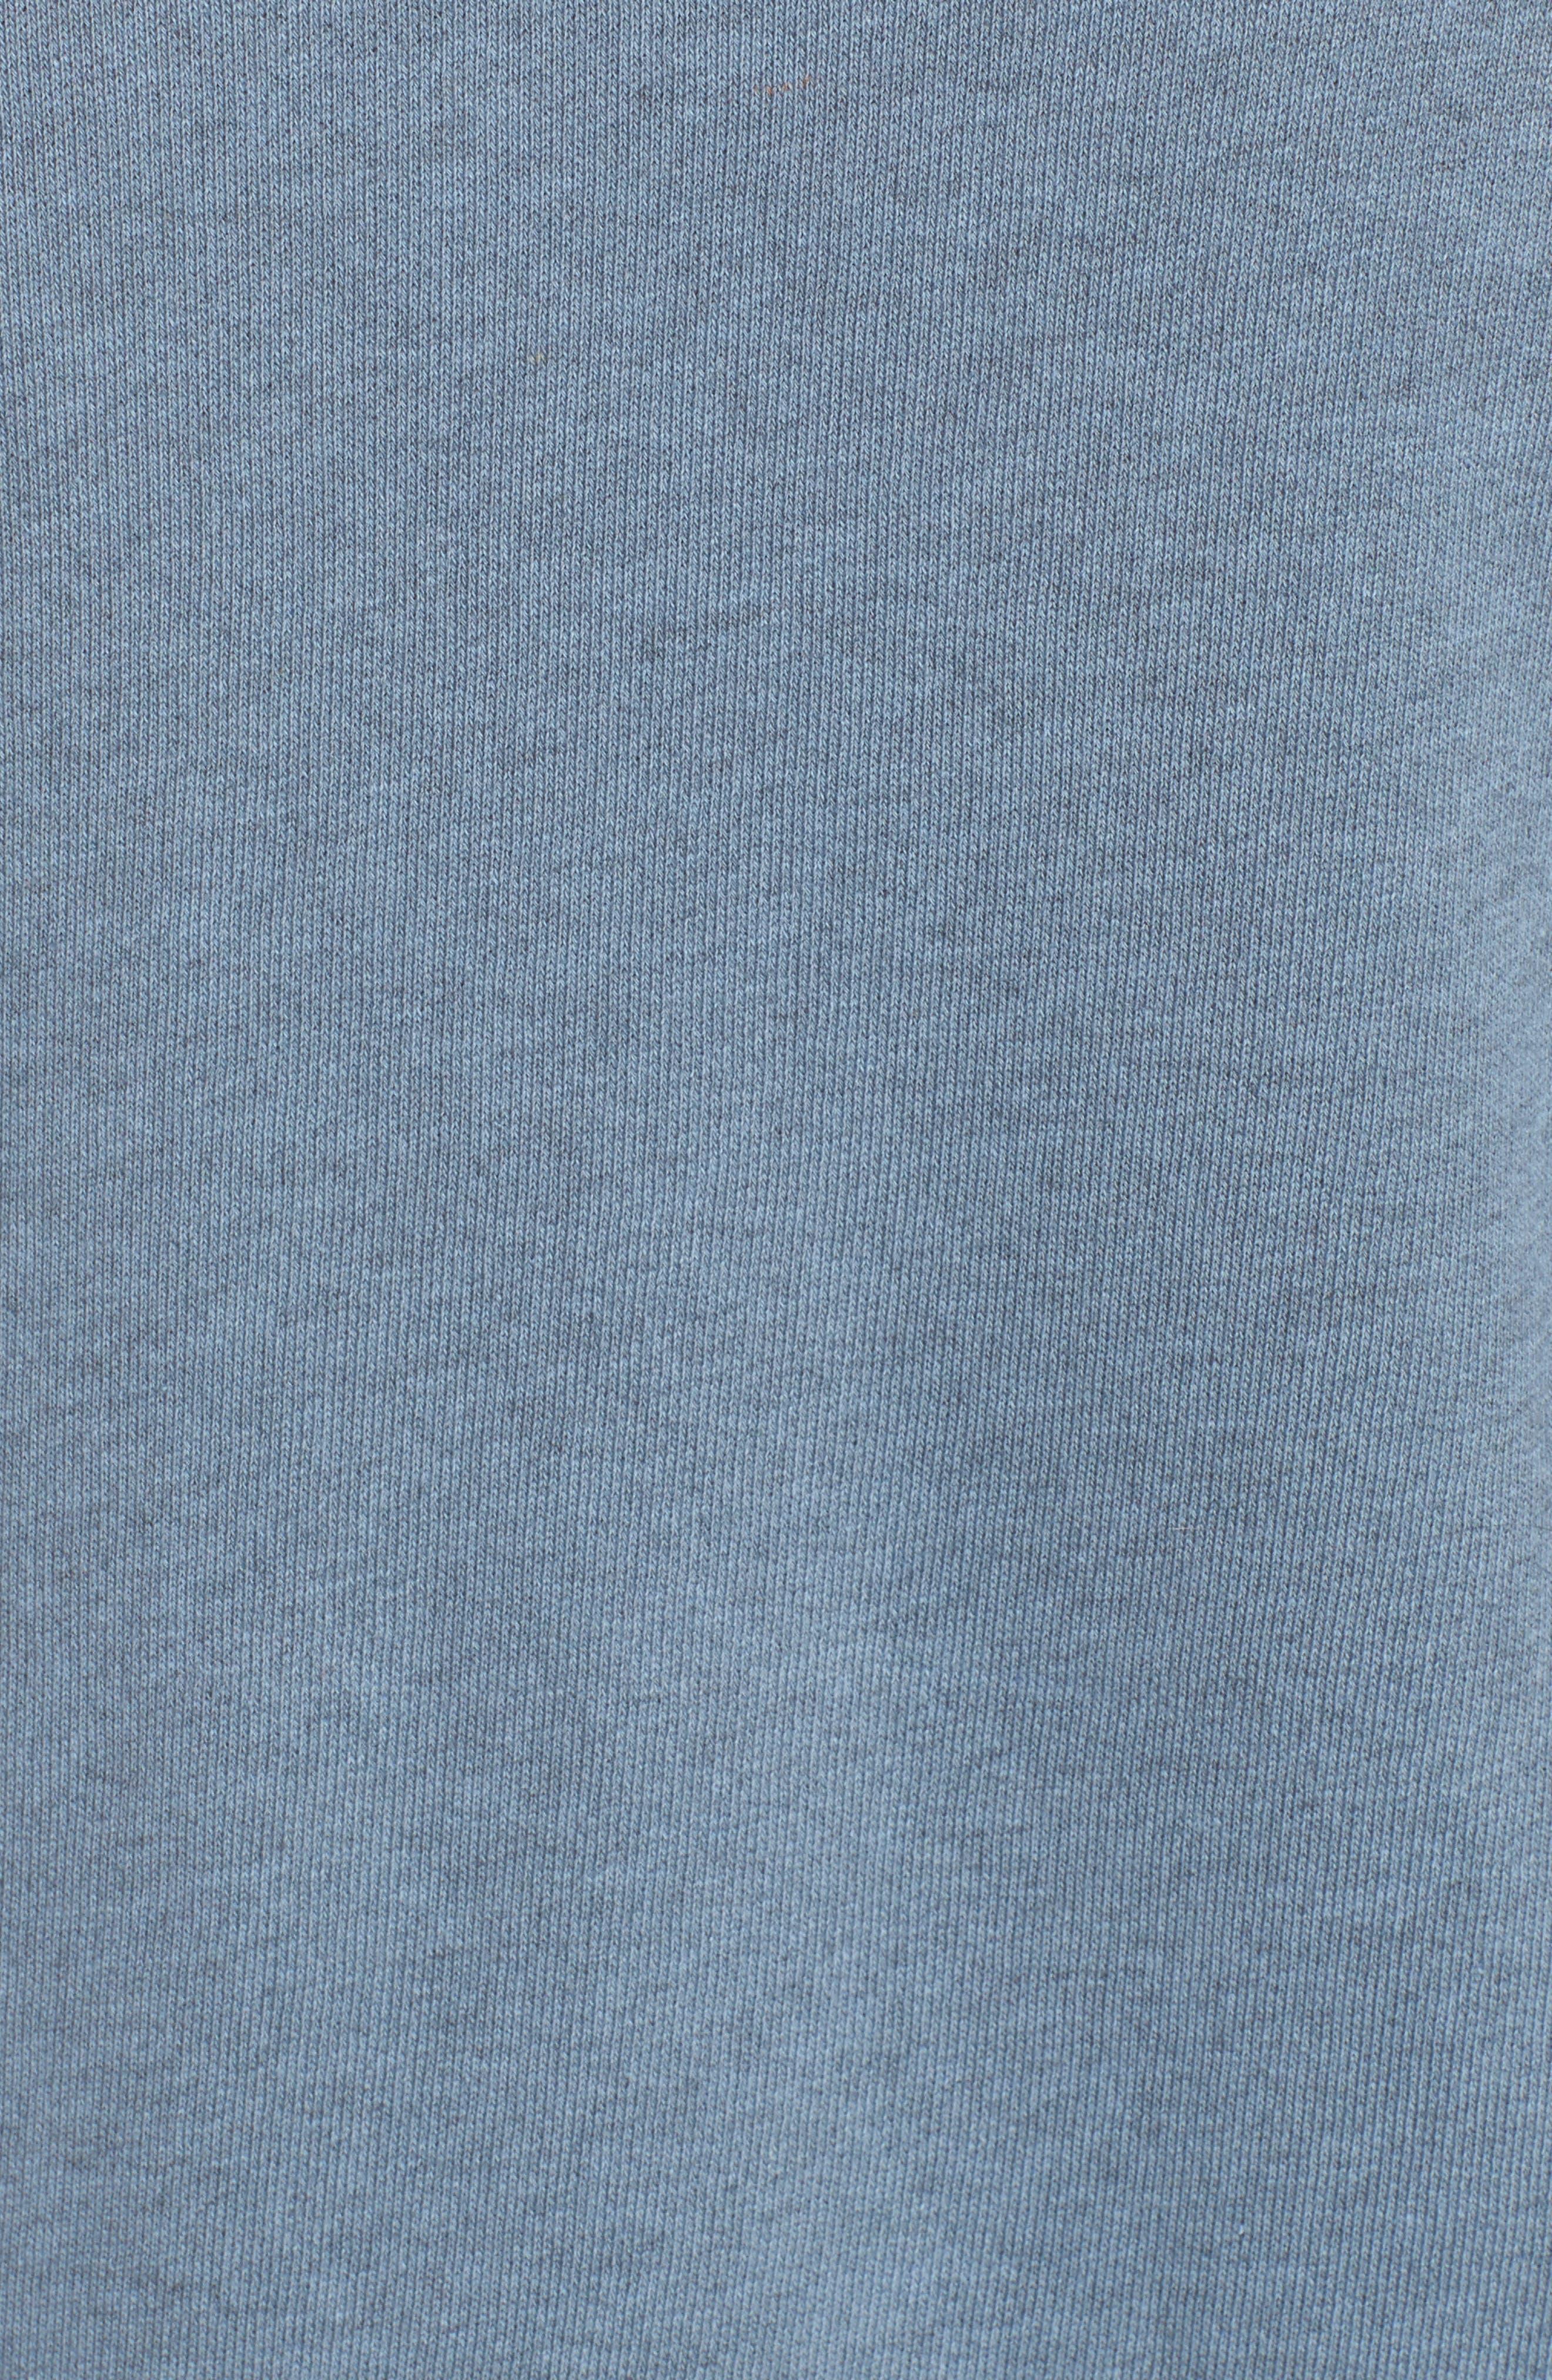 Kyoto Sweatshirt,                             Alternate thumbnail 5, color,                             400